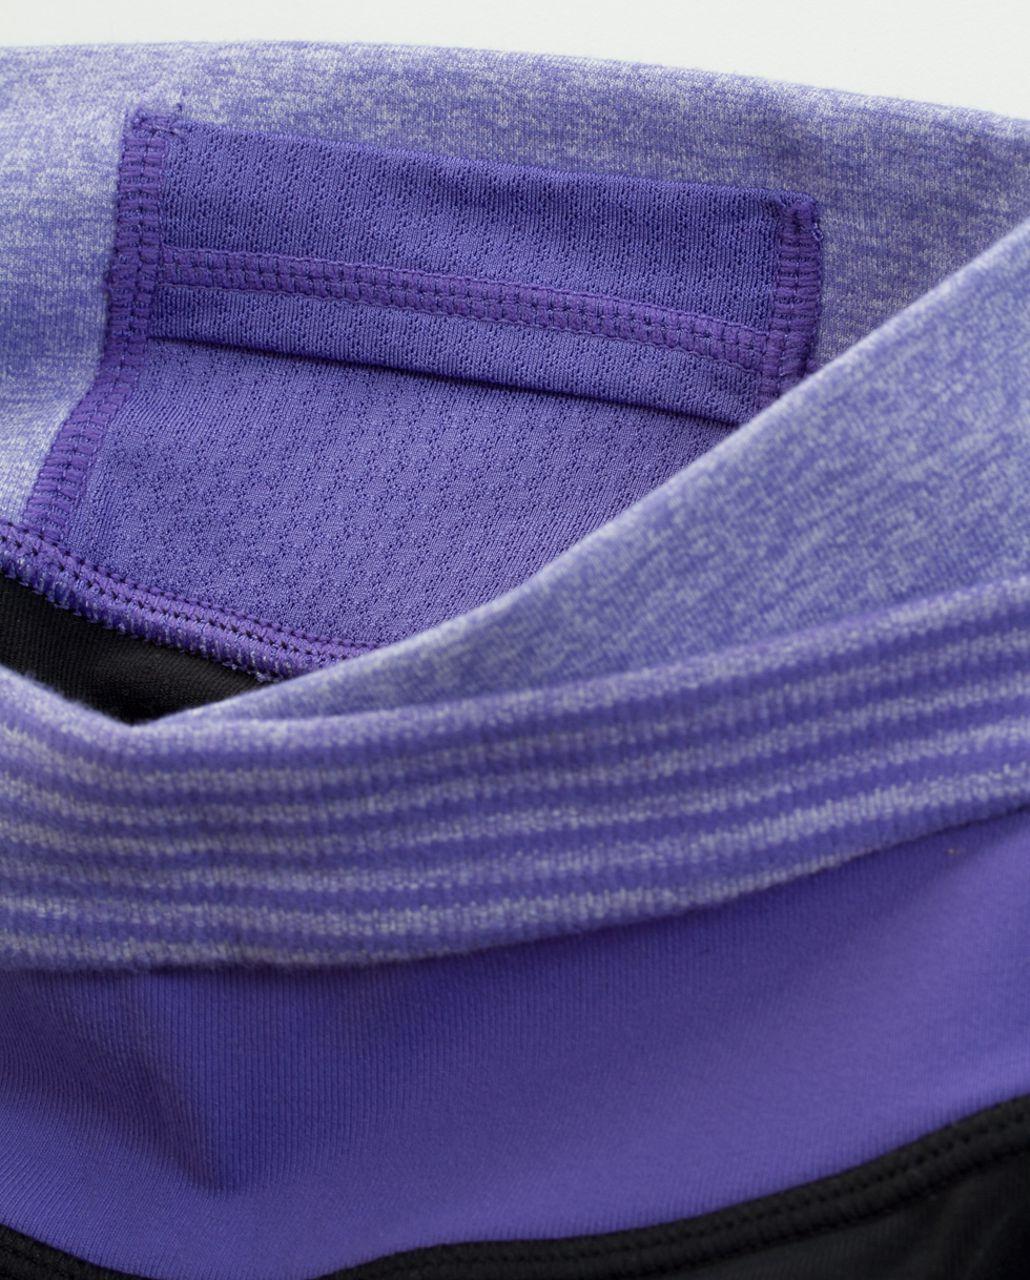 Lululemon Astro Pant (Regular) - Black /  Heathered Persian Purple /  Persian Purple Heathered Persian Mini Check